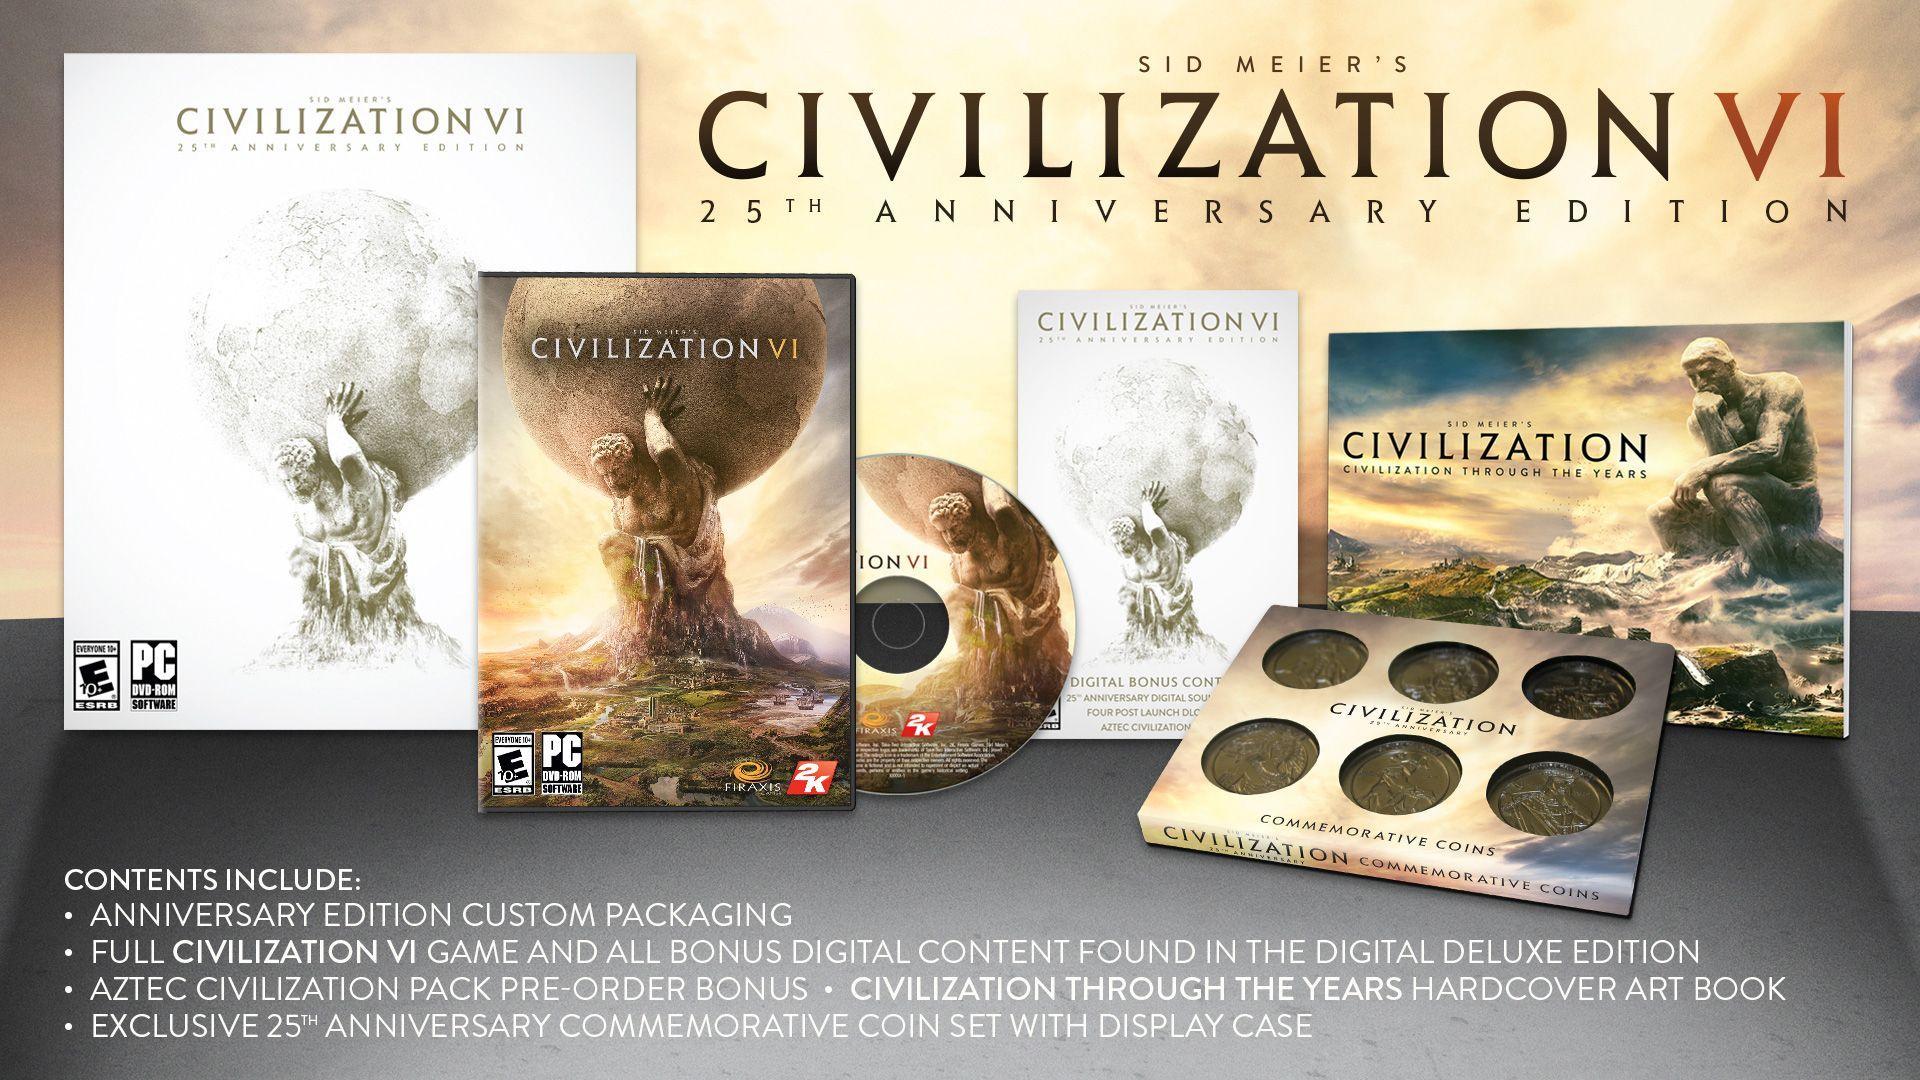 Коллекционное издание Civilization VI 25th Anniversary Edition